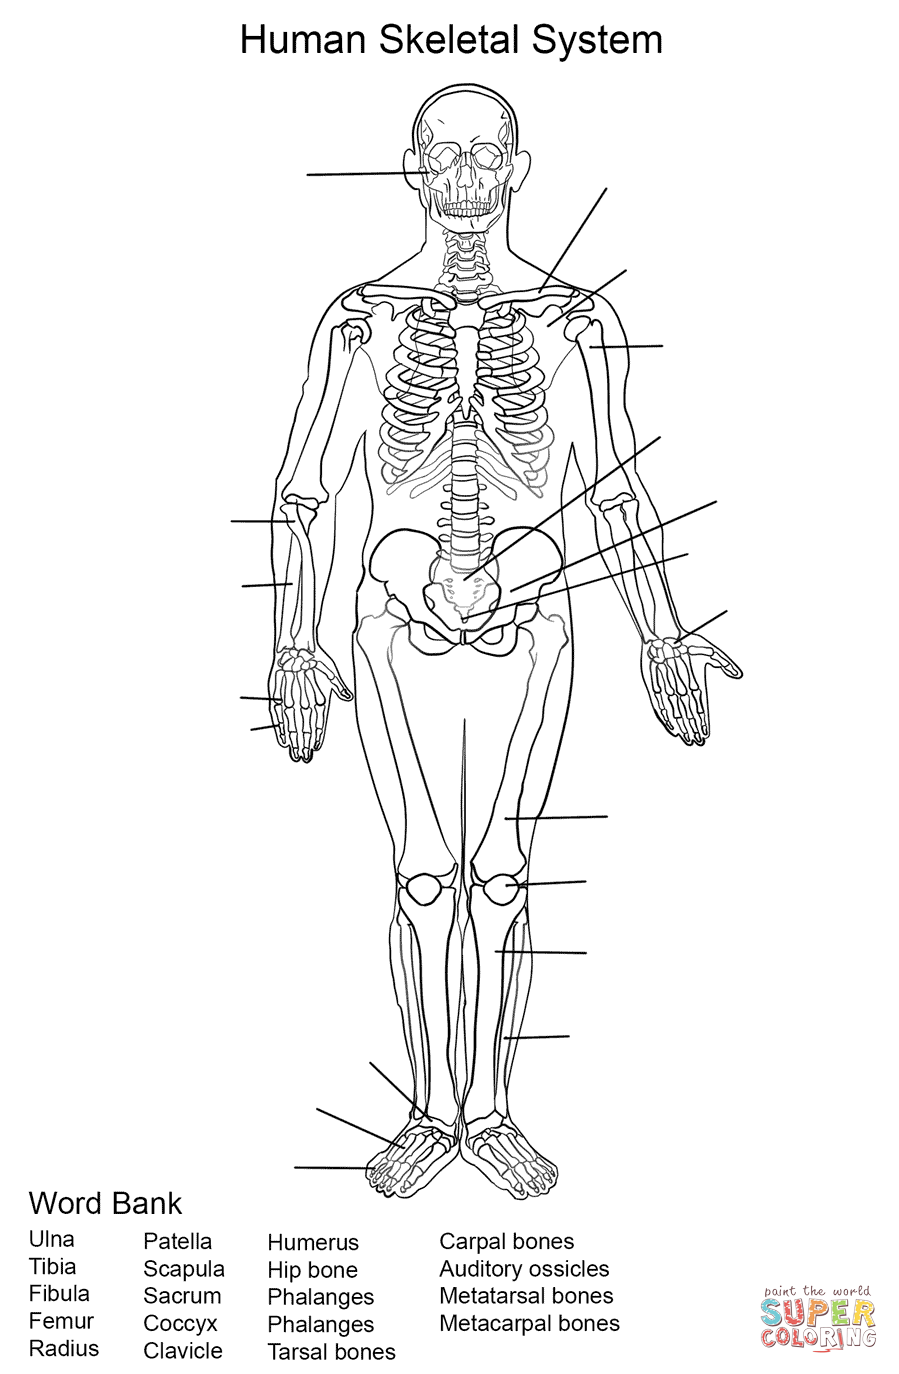 Human Skeletal System Worksheet Coloring Page – Circulatory System Worksheets Kids